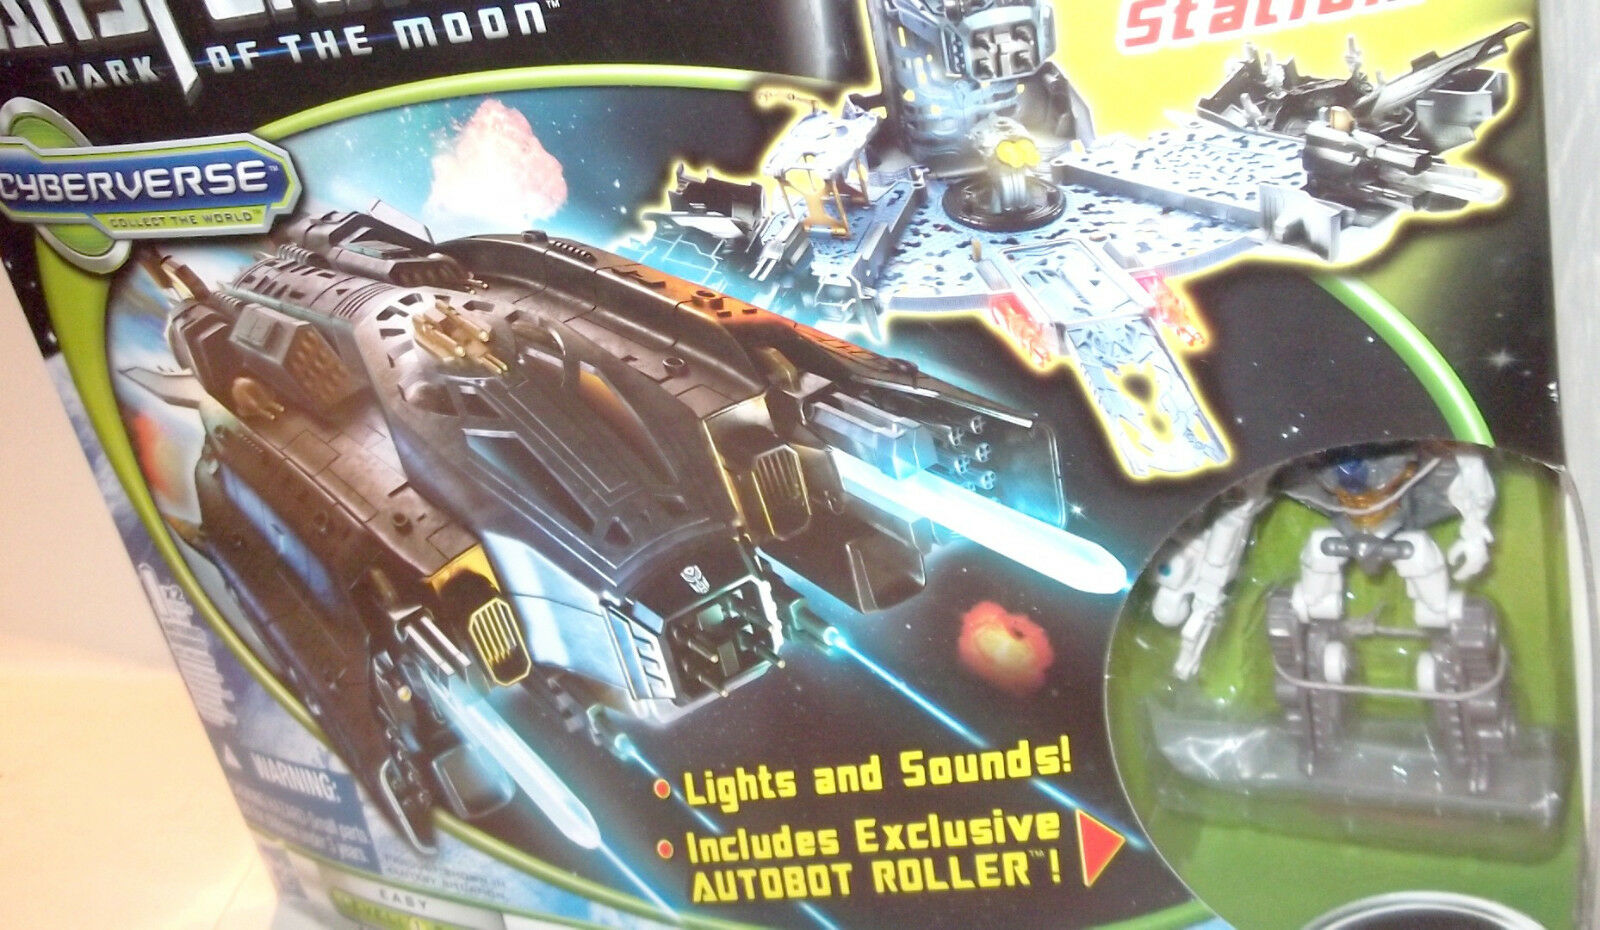 Transformers Dark Of The Moon Cyberverse AUTOBOT ARK Roller 2-1 Lights & Sounds